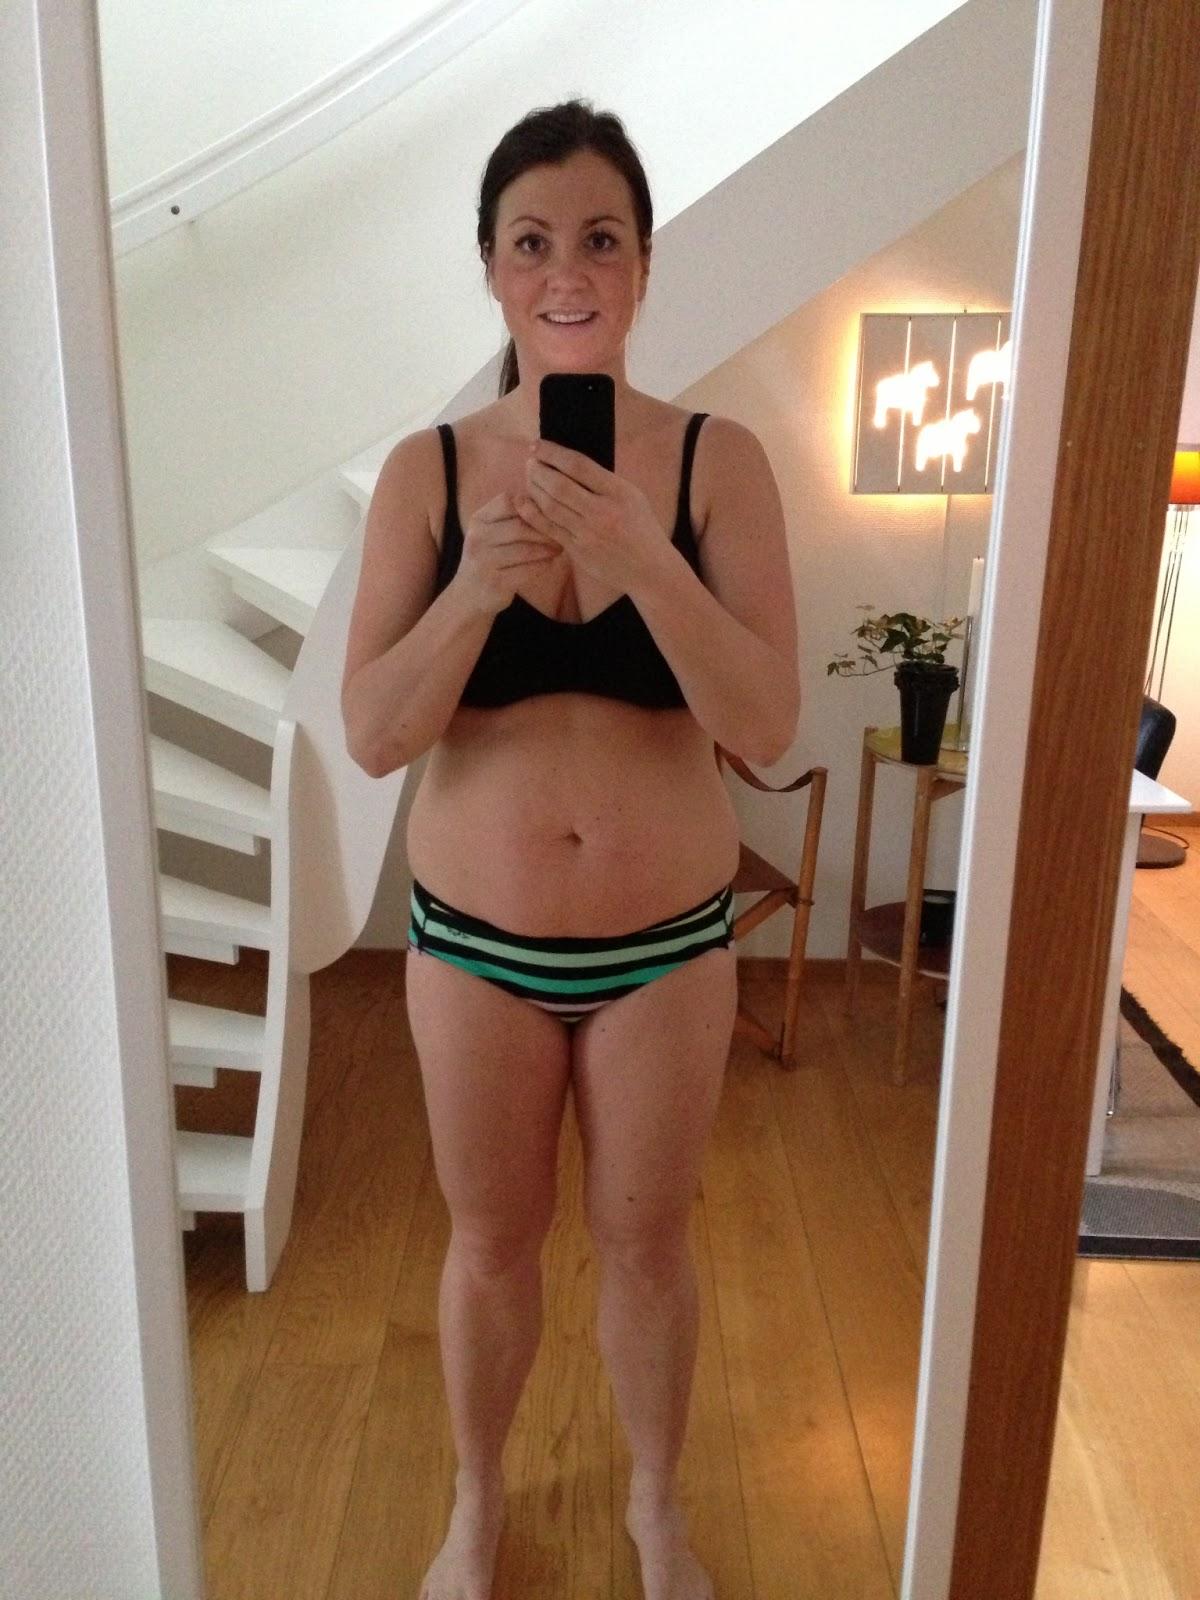 äkta kvinnor sexig i Göteborg